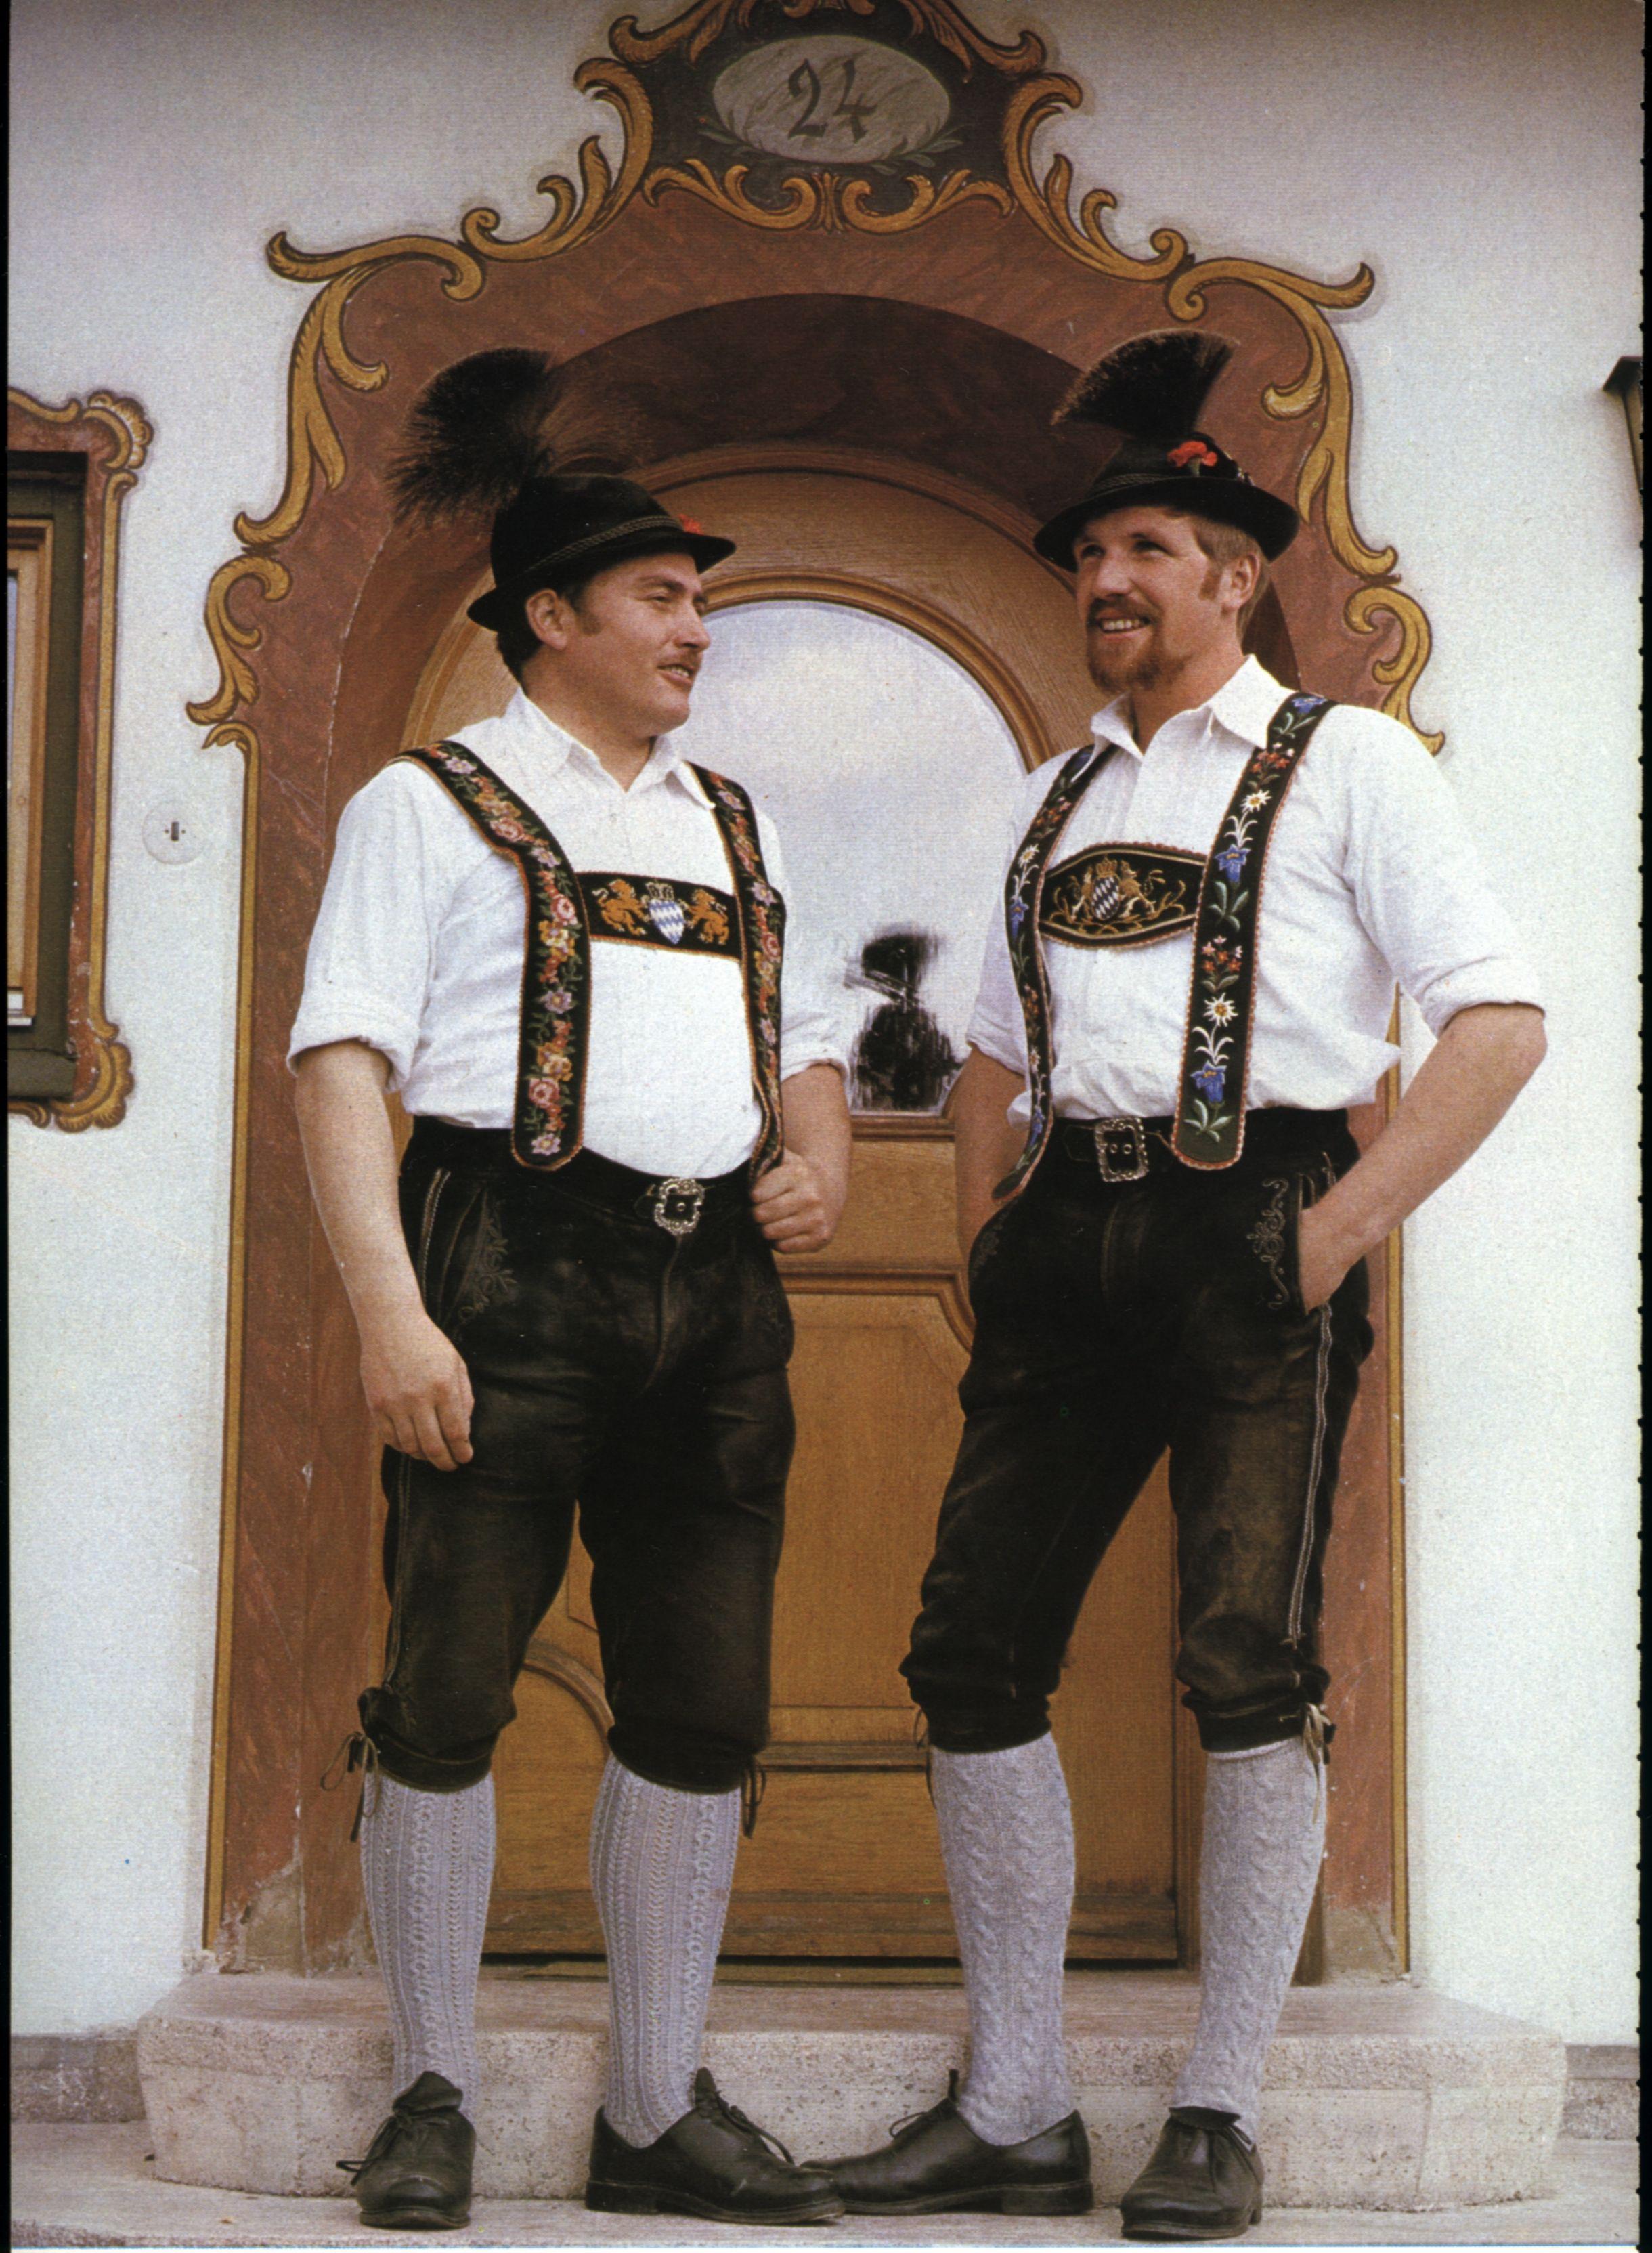 Zwei Männer in Werdenfelser Tracht | Trachten lederhose